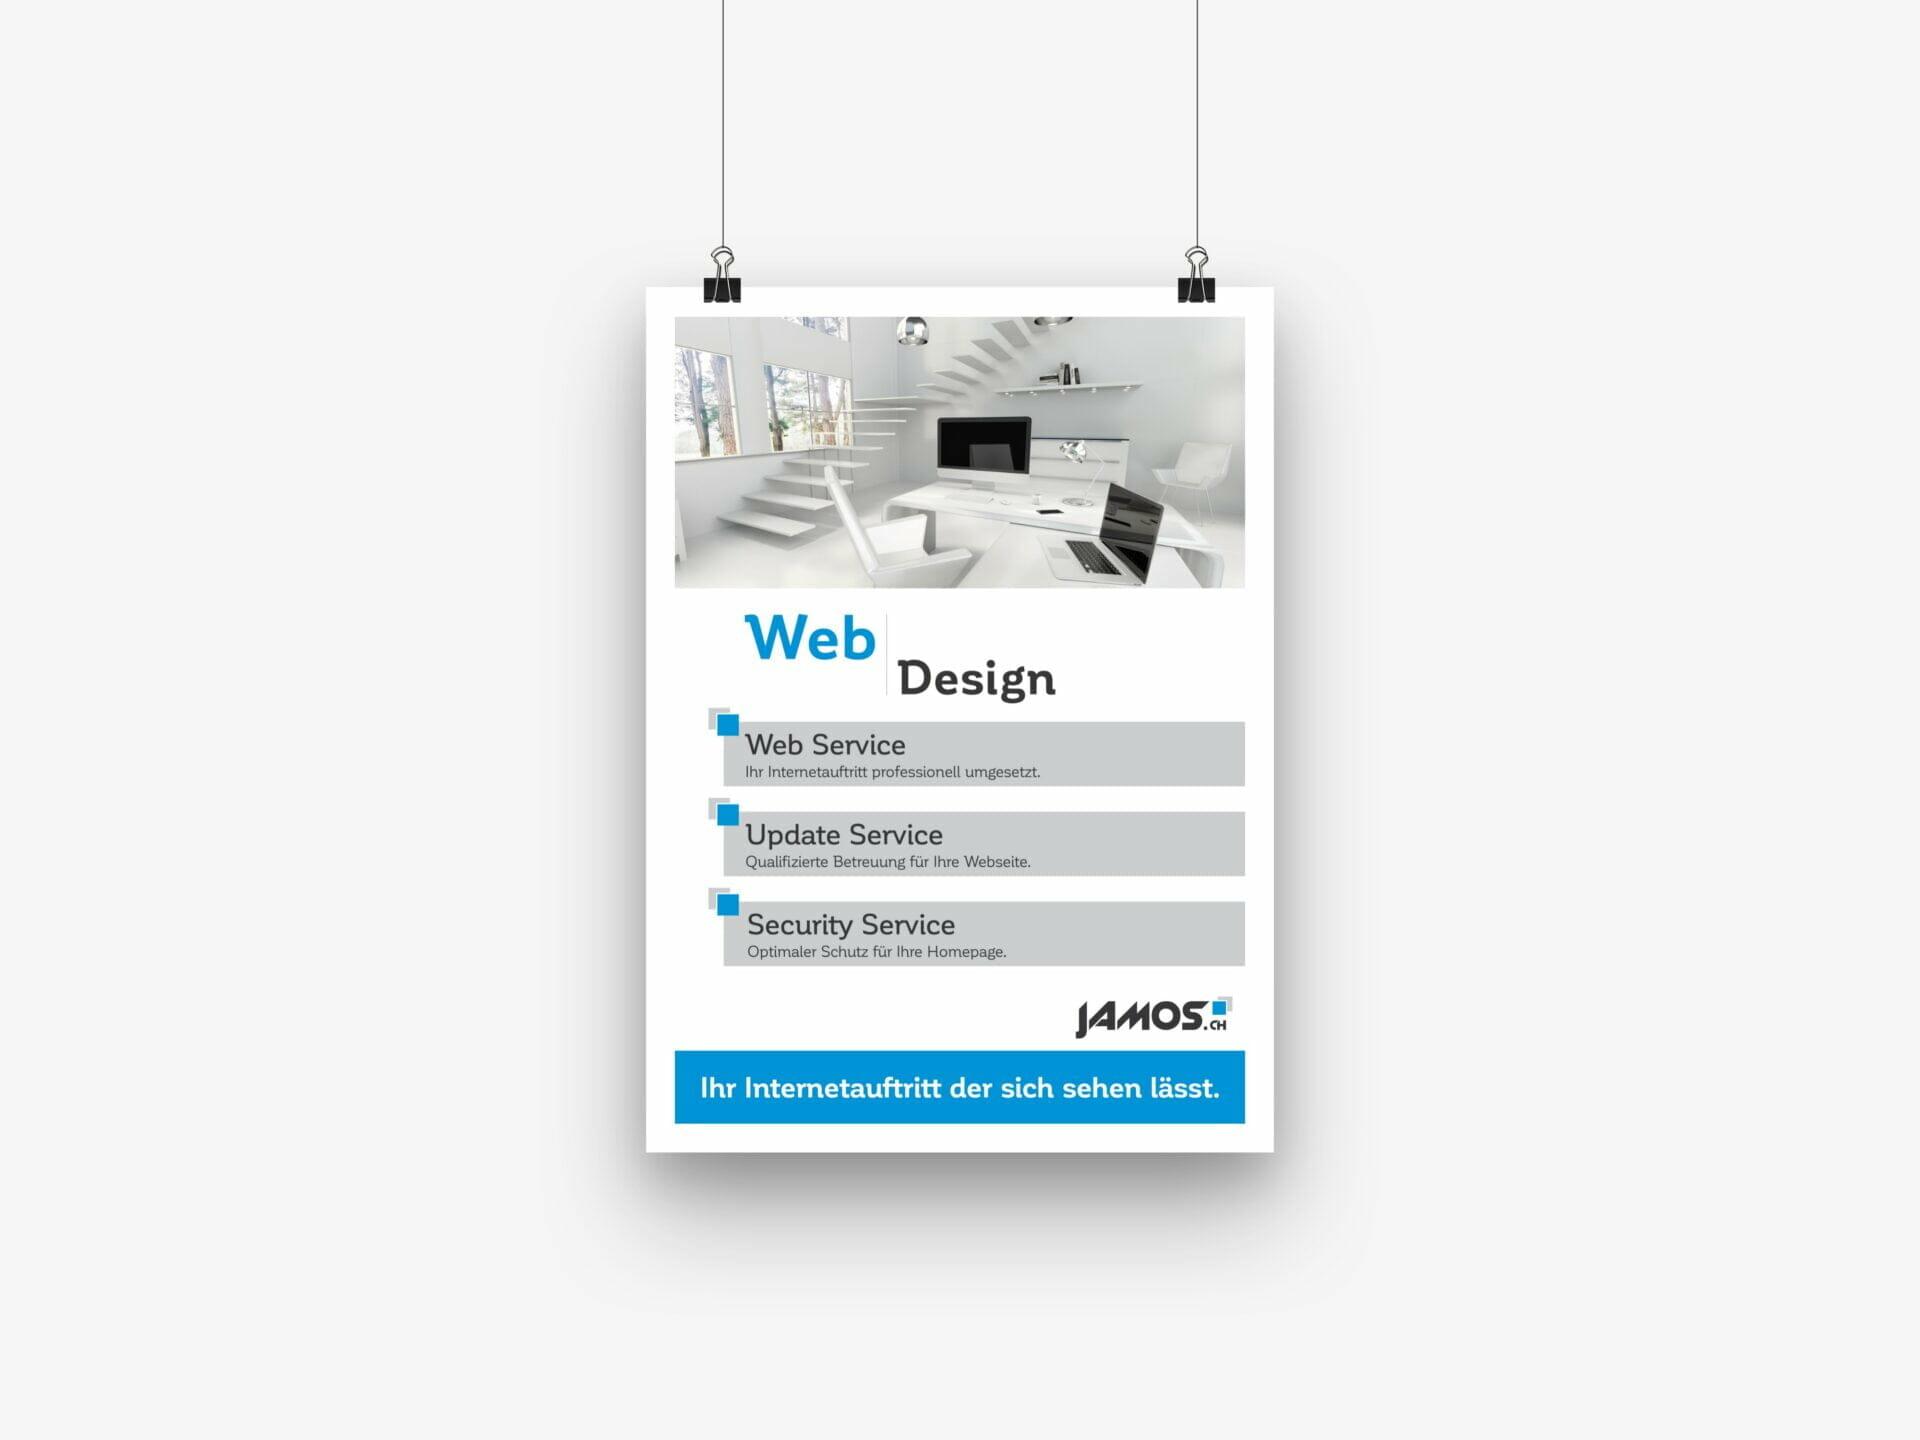 JAMOS Web Design